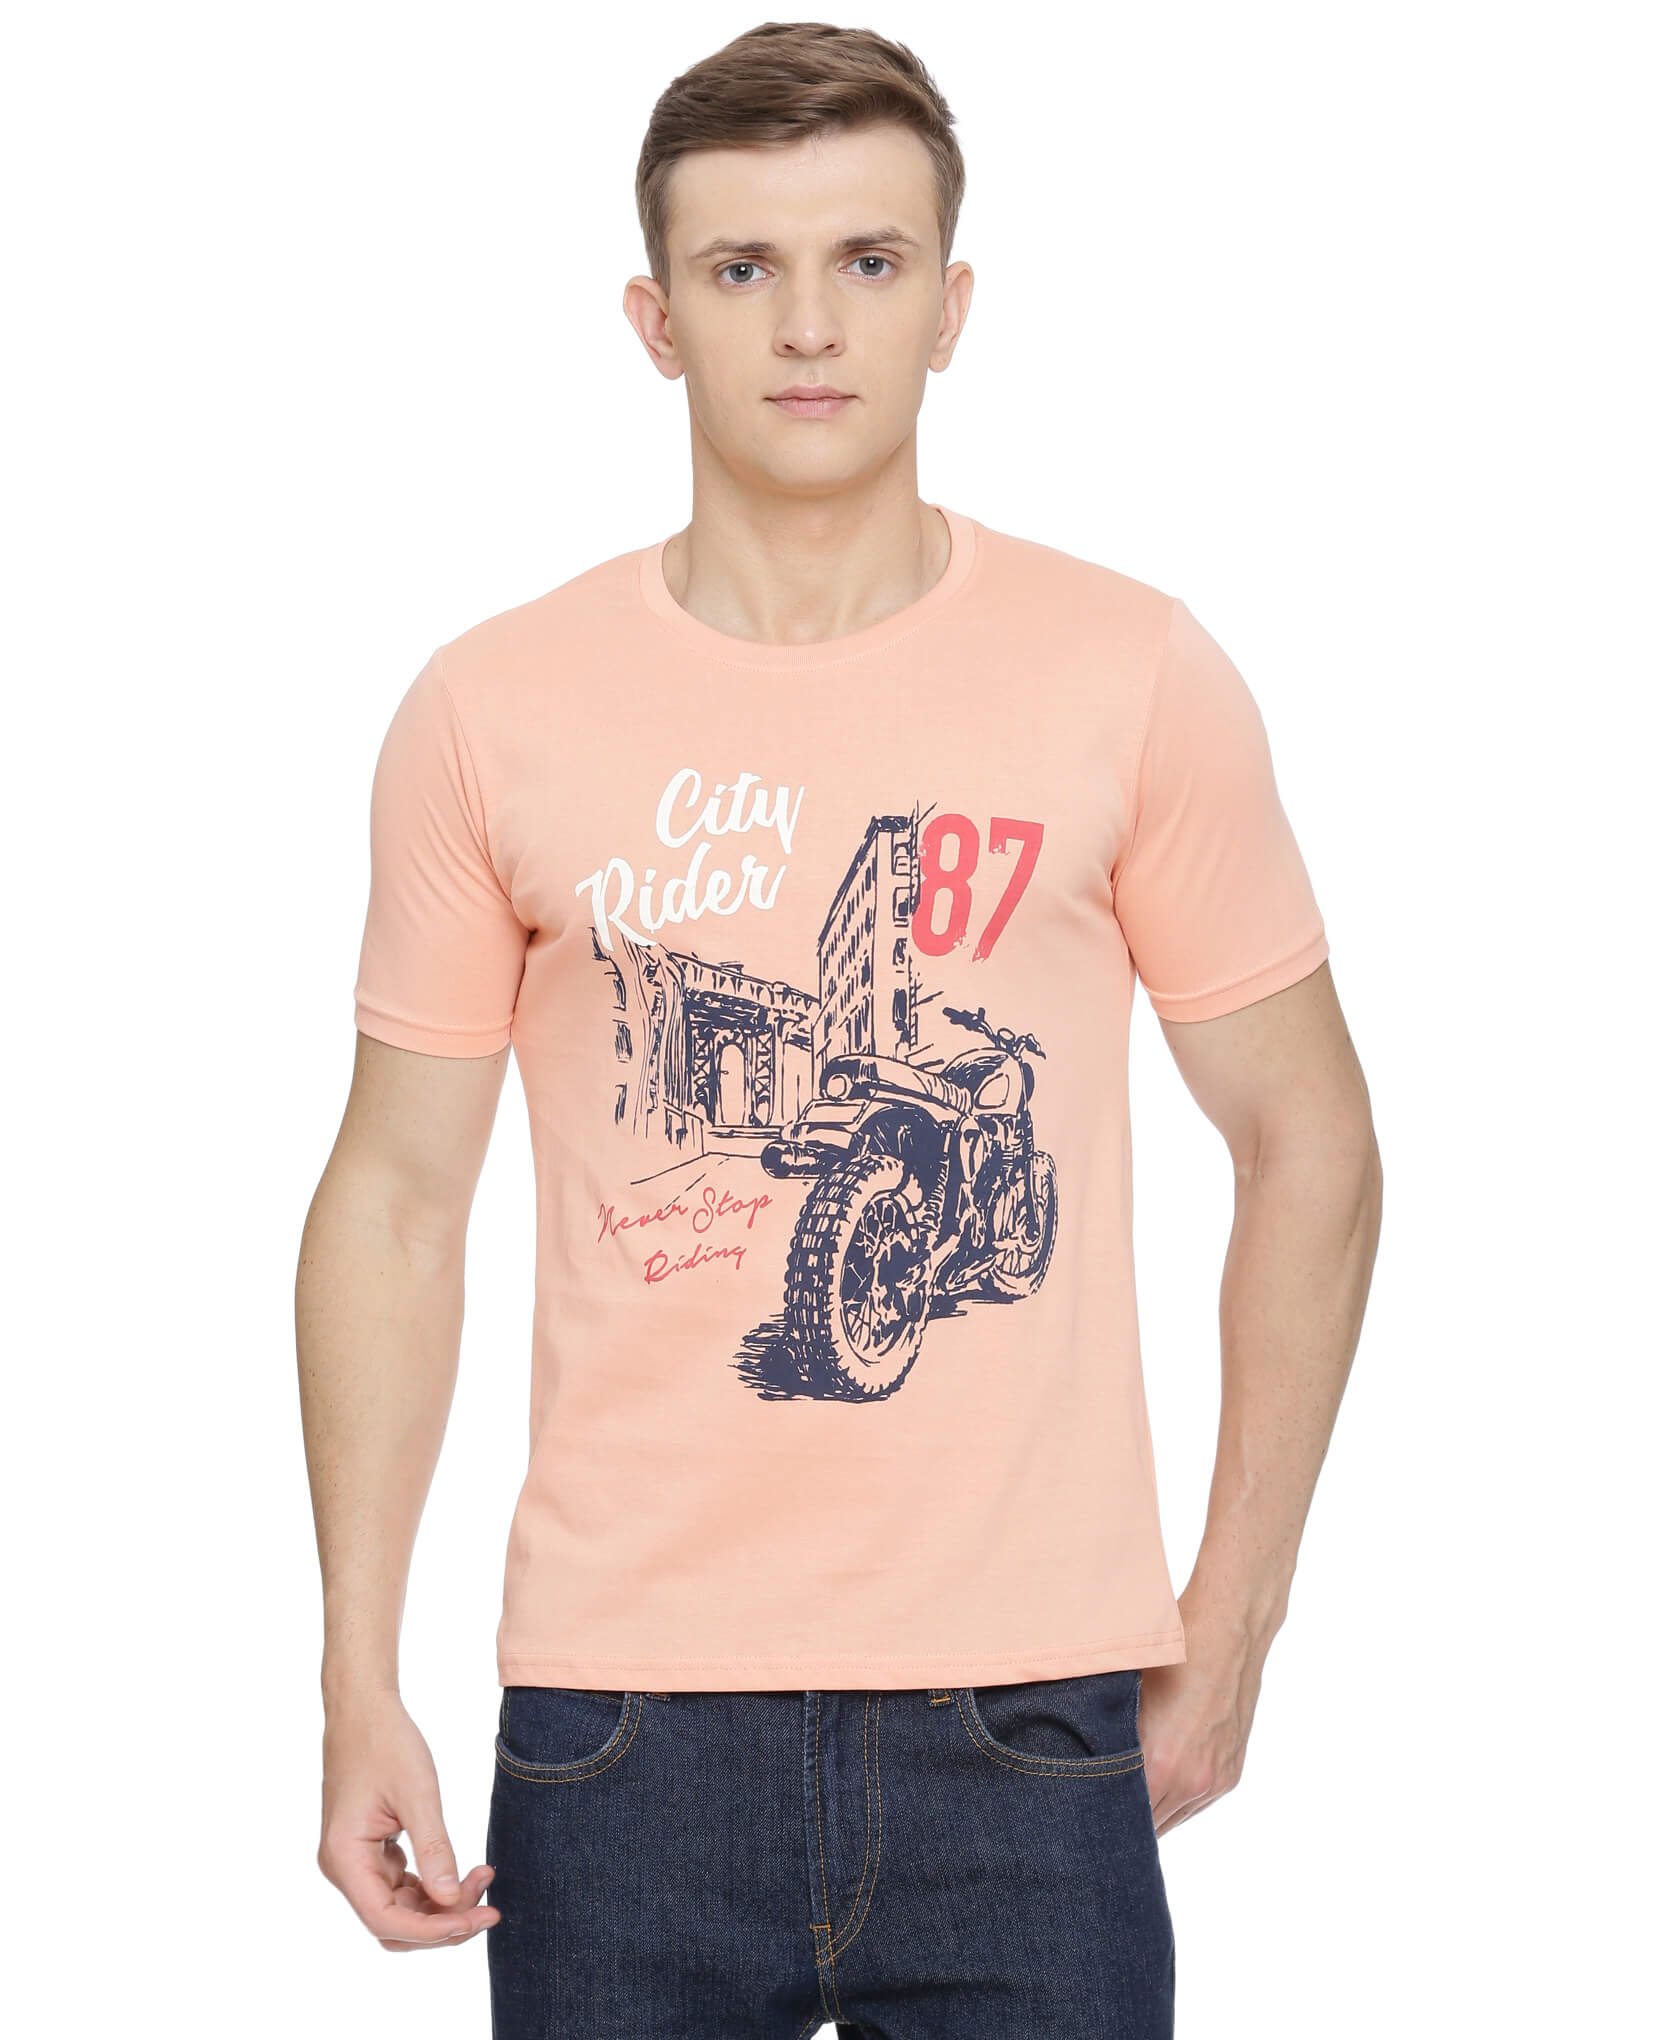 ATIVO Coral 87 City Rider Tee